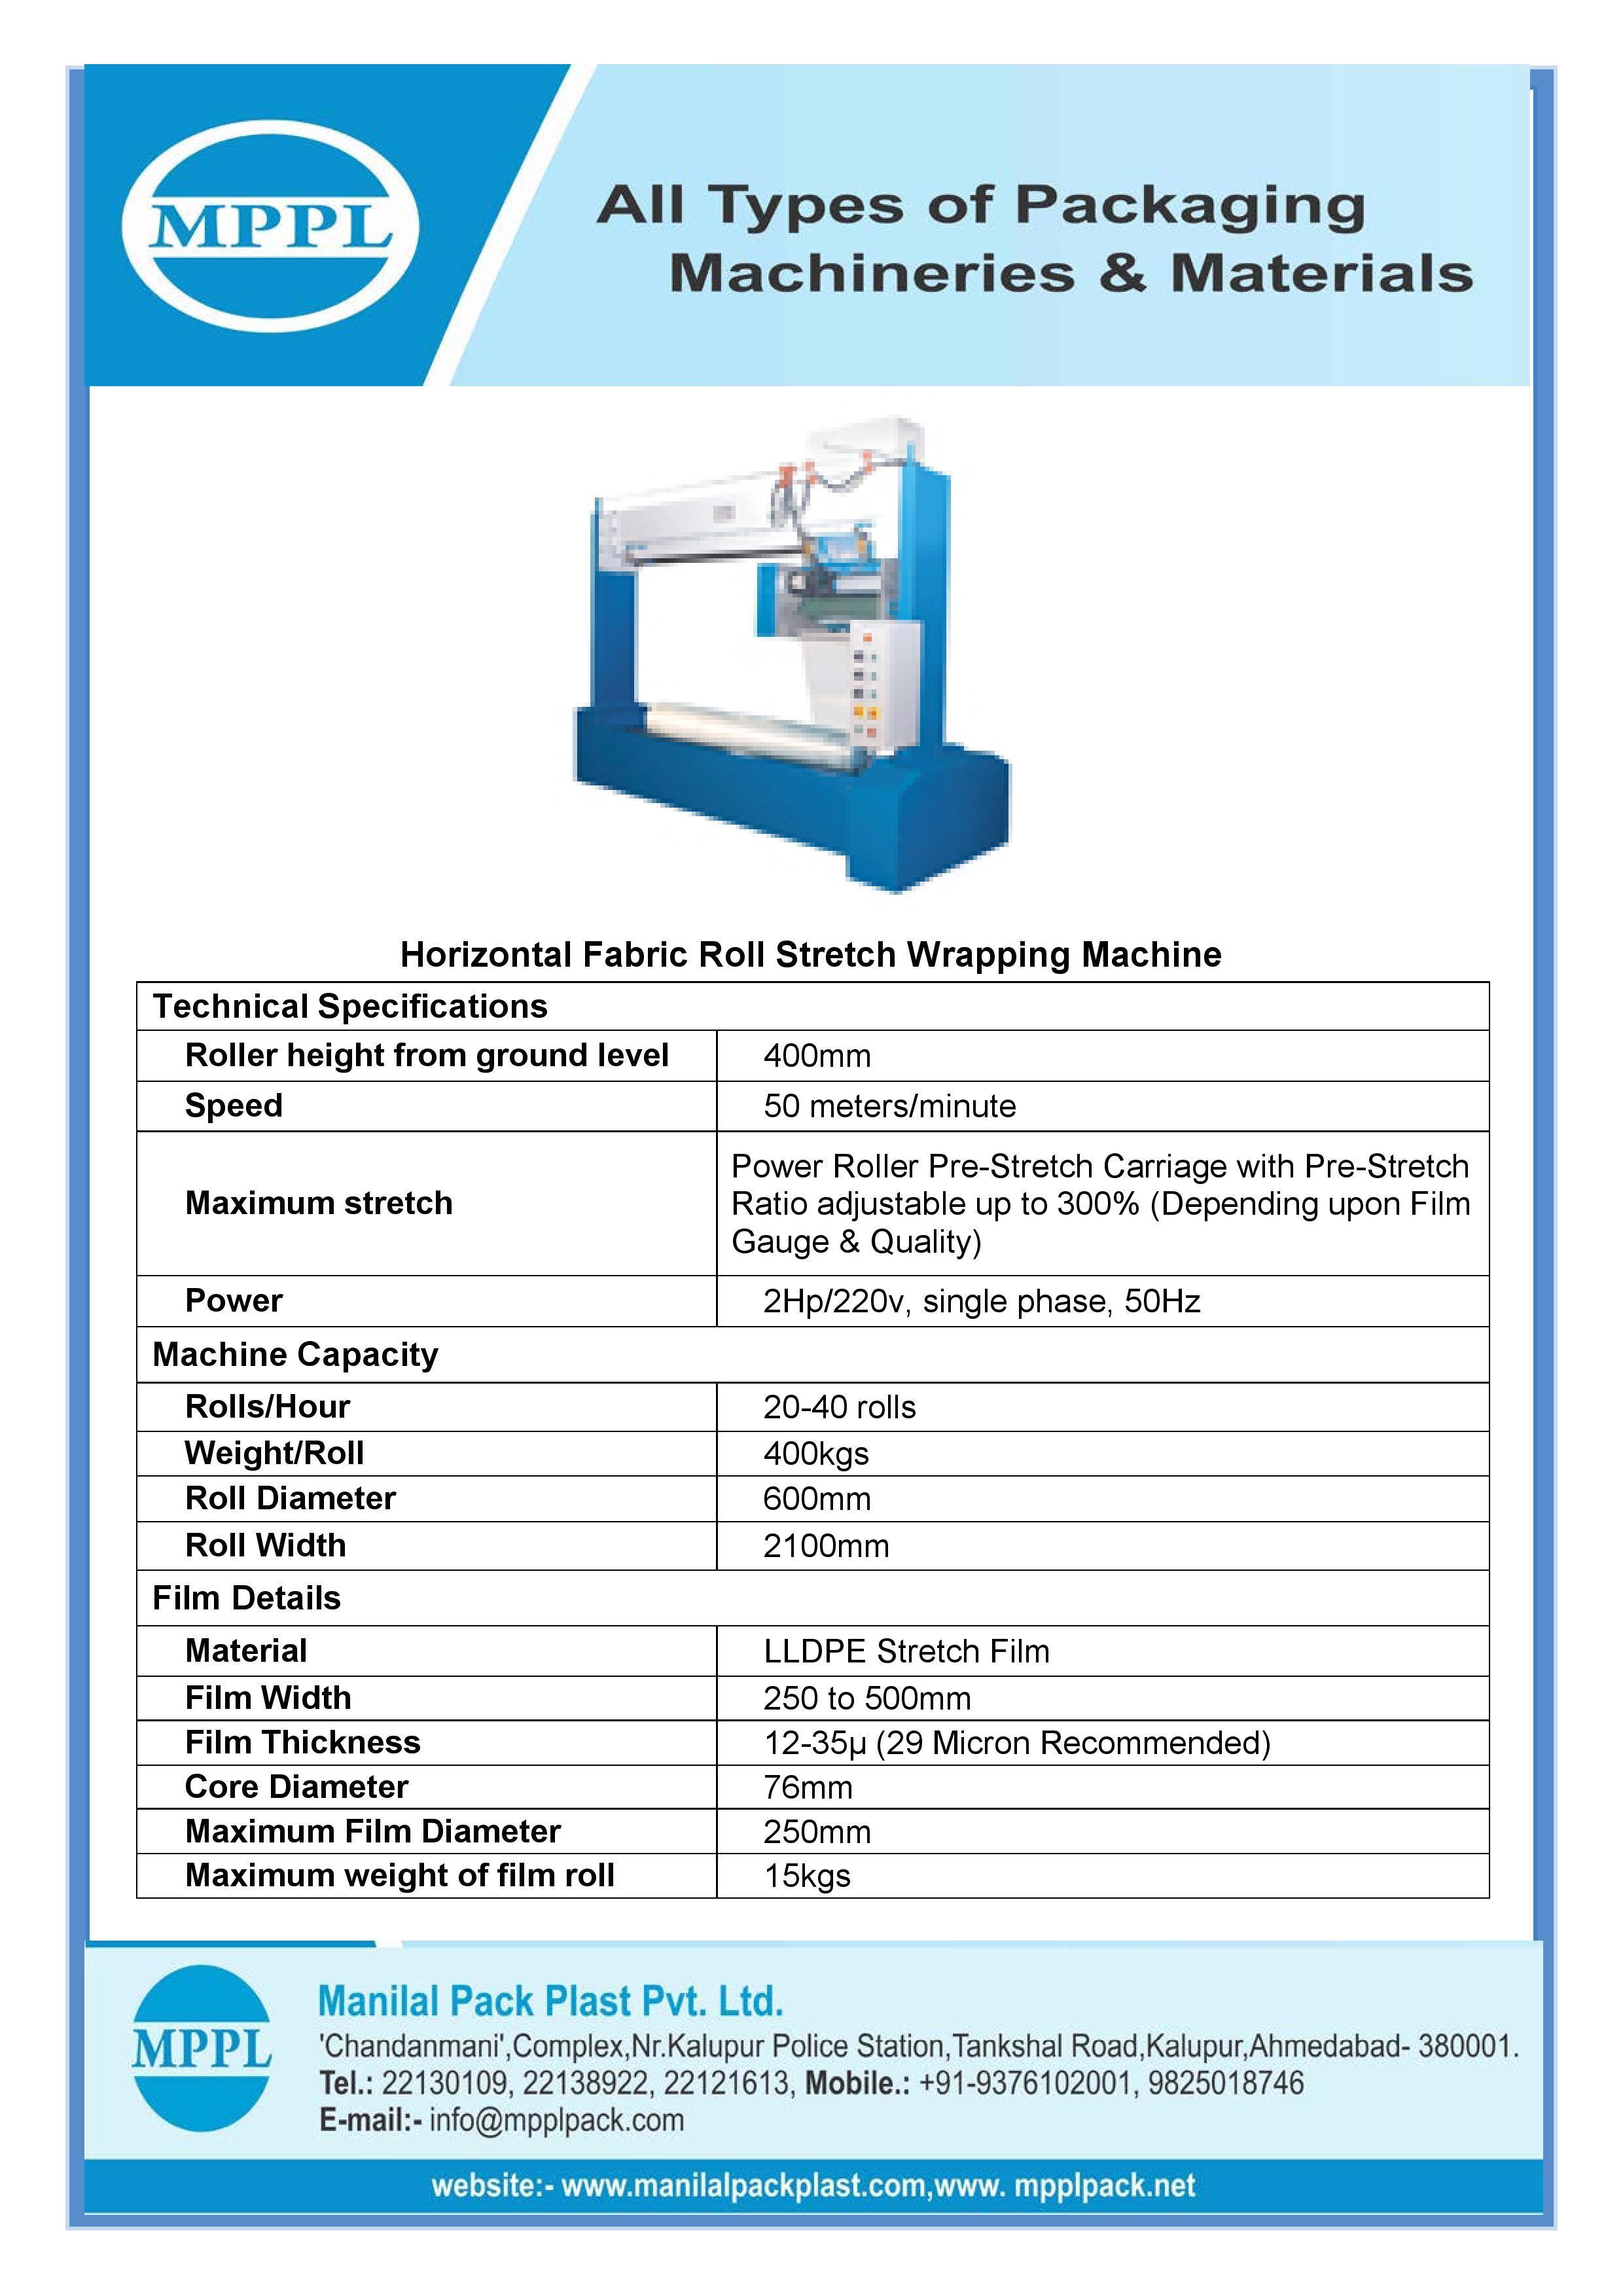 Horizontal Fabric Roll Stretch Wrapping Machine